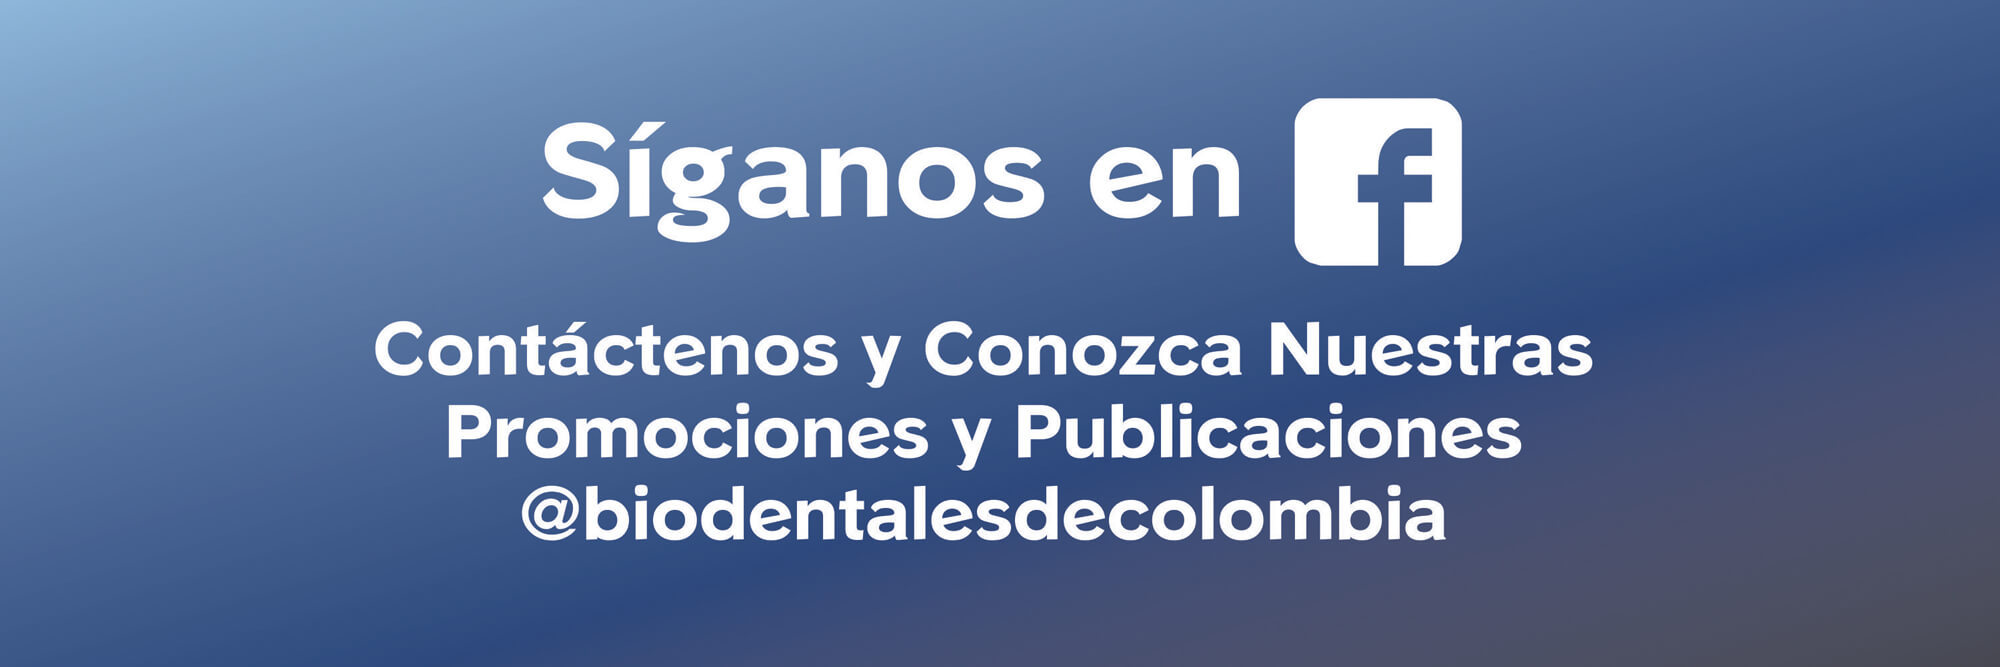 facebookBiodentales